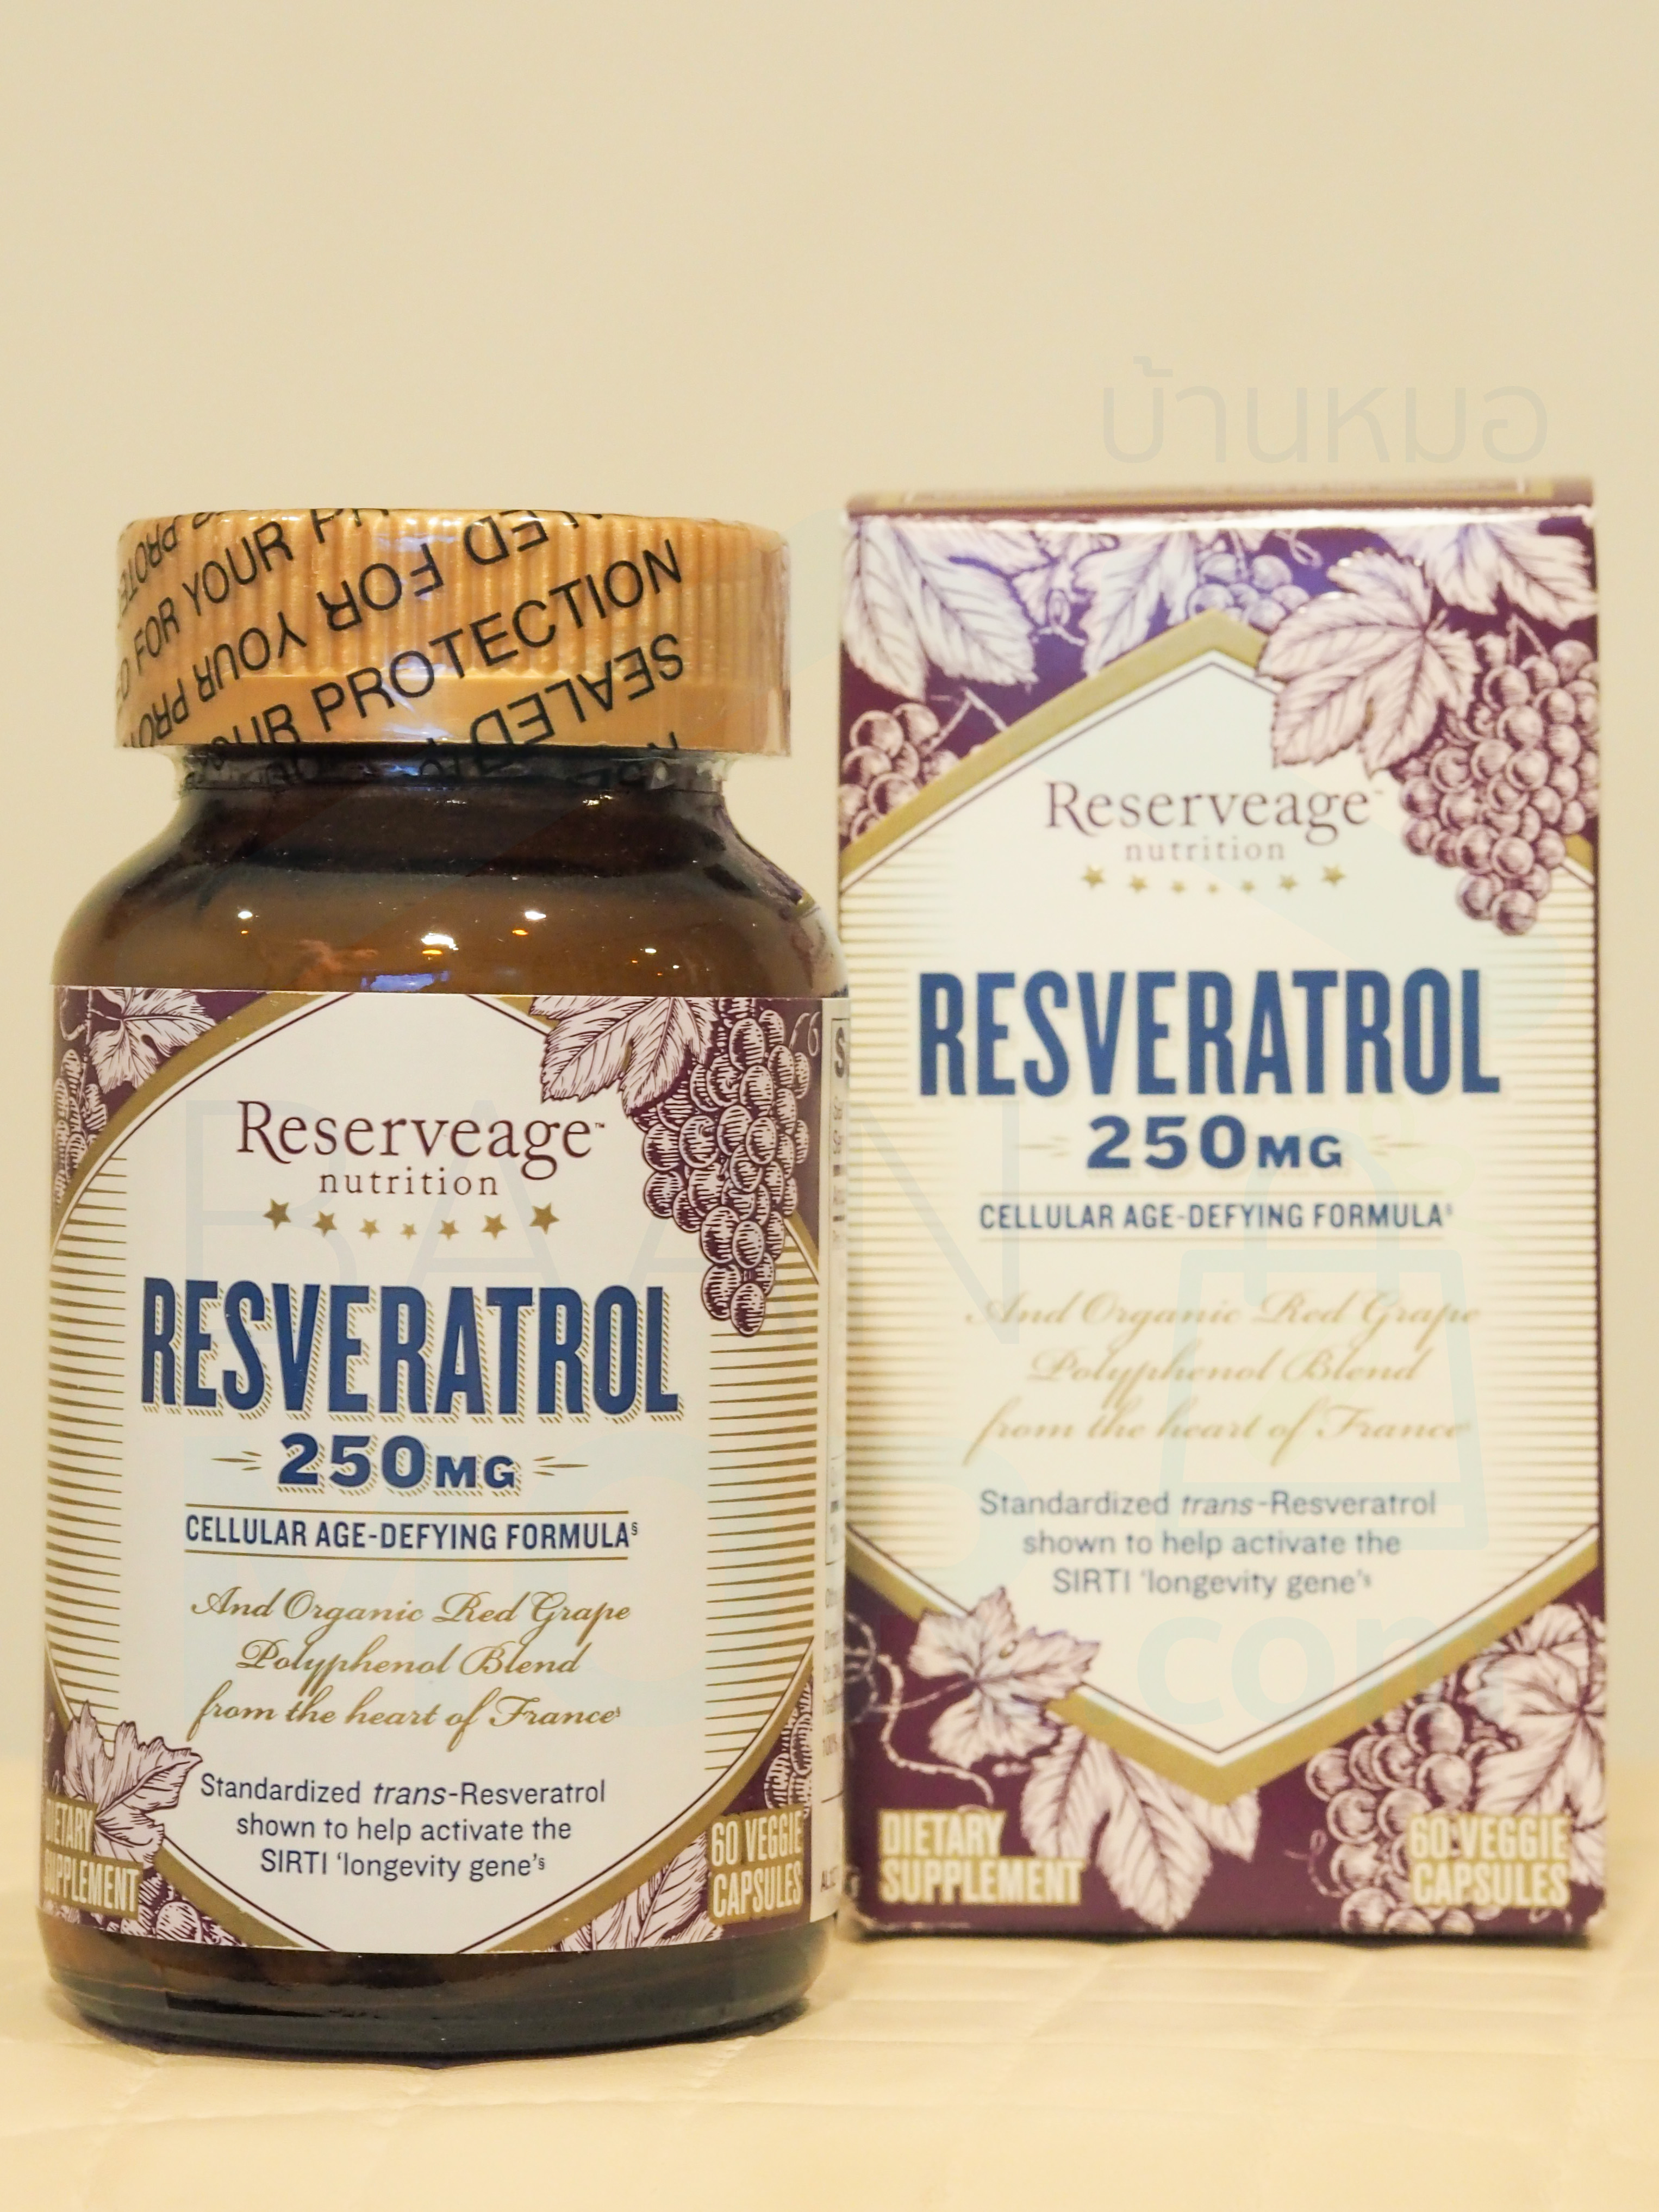 Resveratrol 250 mg 60 Capsules สารต้านอนุมูลอิสระ เรสเวอราทรอล 250 มก 60 แคปซูล และมี Silbinol และ Quercetin ป้องกันการอักเสบ รักษาระดับน้ำตาลและคลอเรสเตอคอลในเลือดให้อยุ่ในระดับปกติ ป้องกันการอุดตันในหลอดเลือด จาก ReserveAge™ Organics